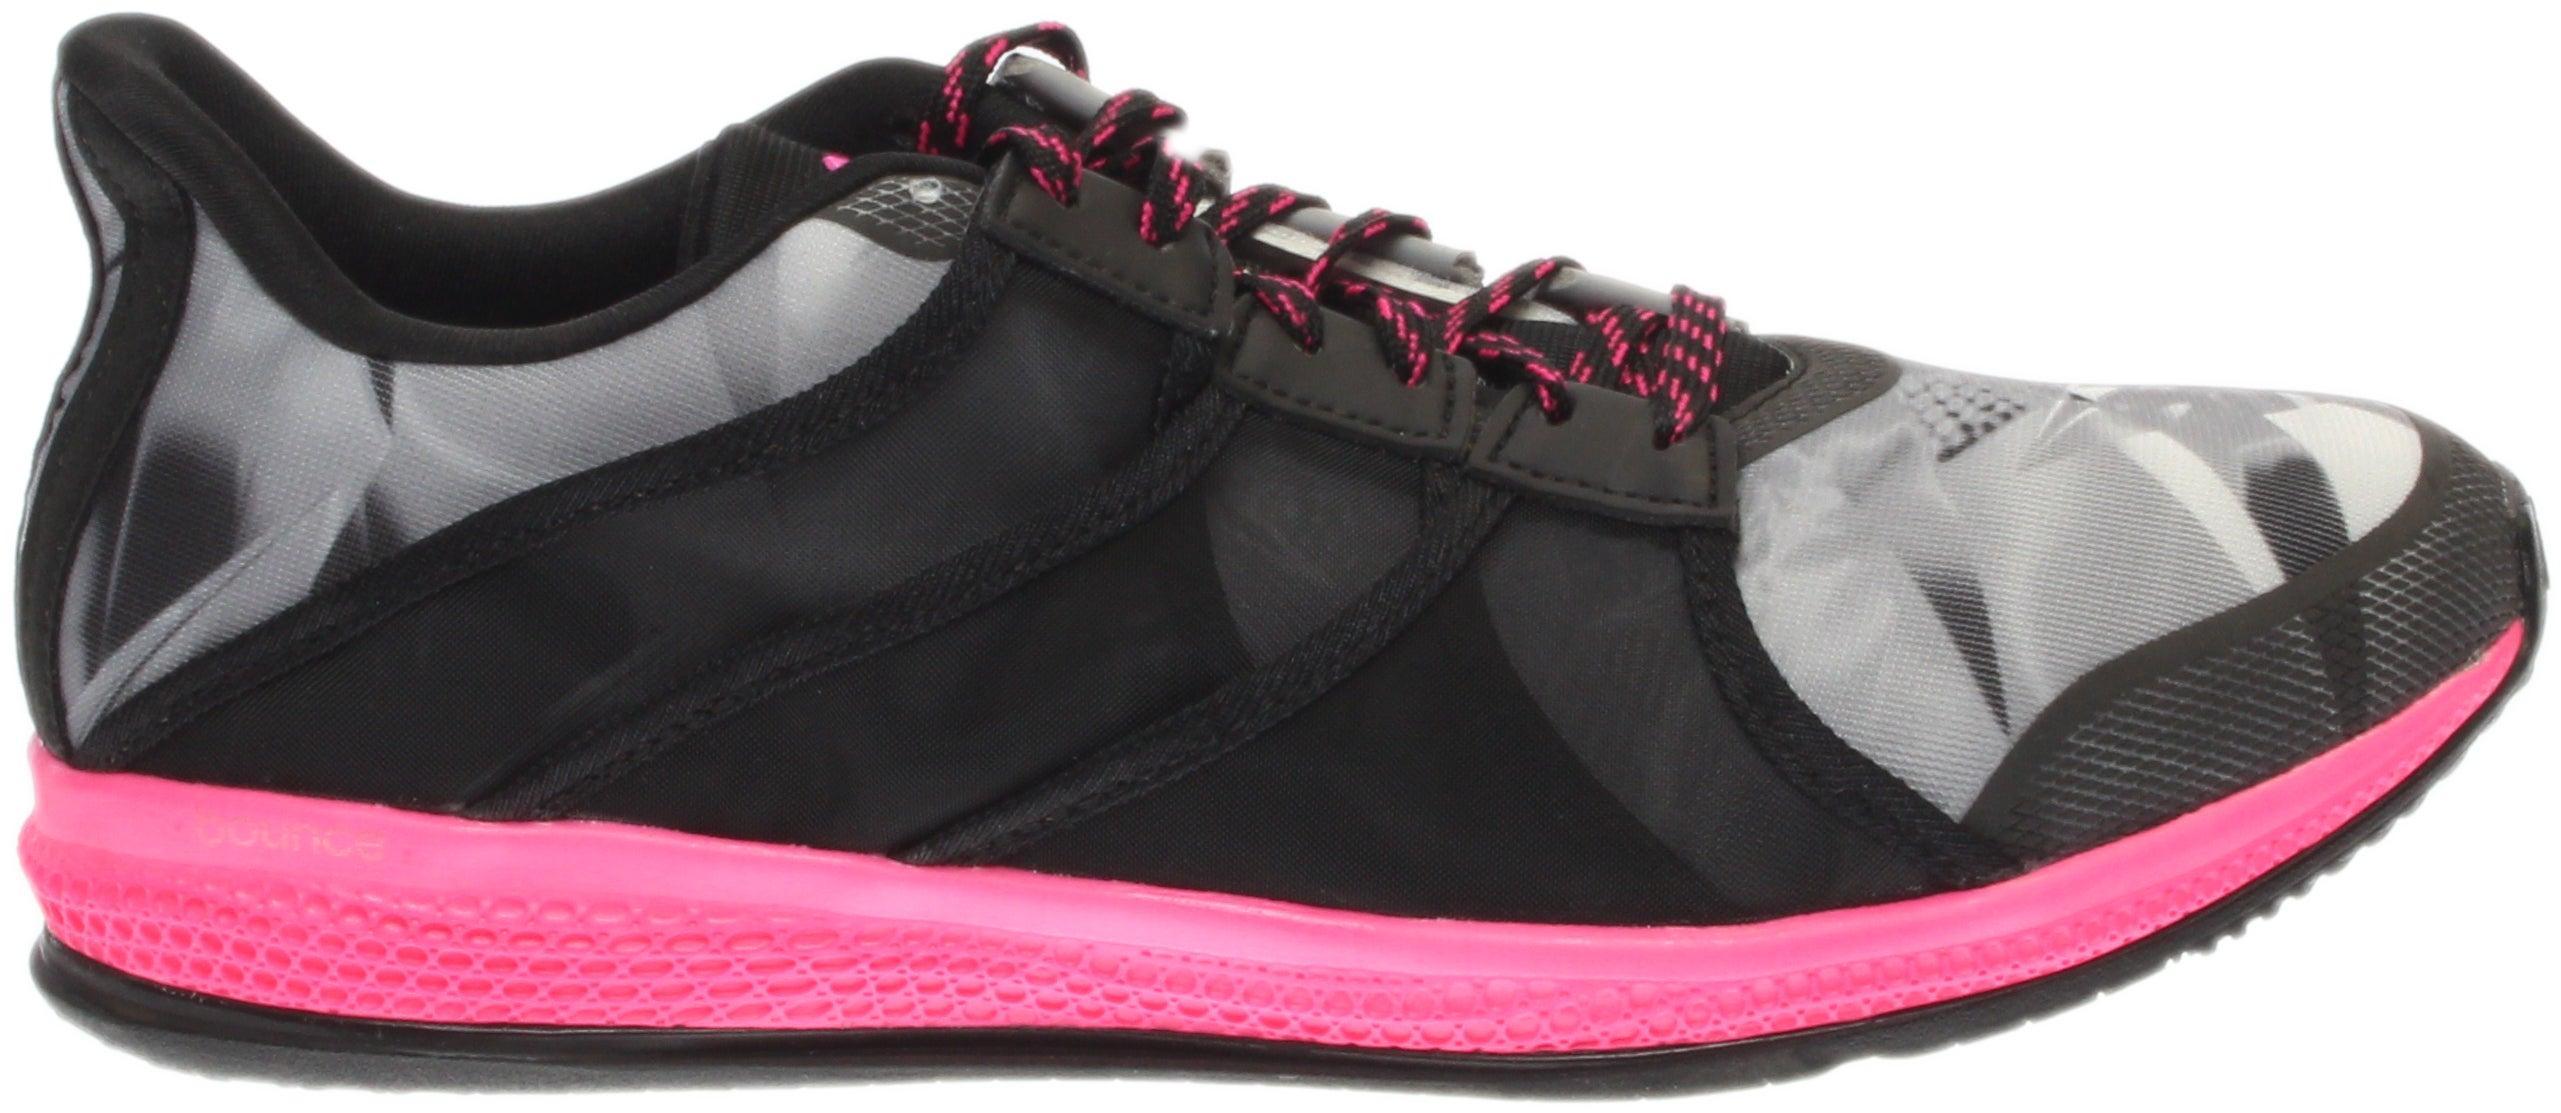 adidas adidas Gymbreaker Bounce Black - Womens  - Size 5.5